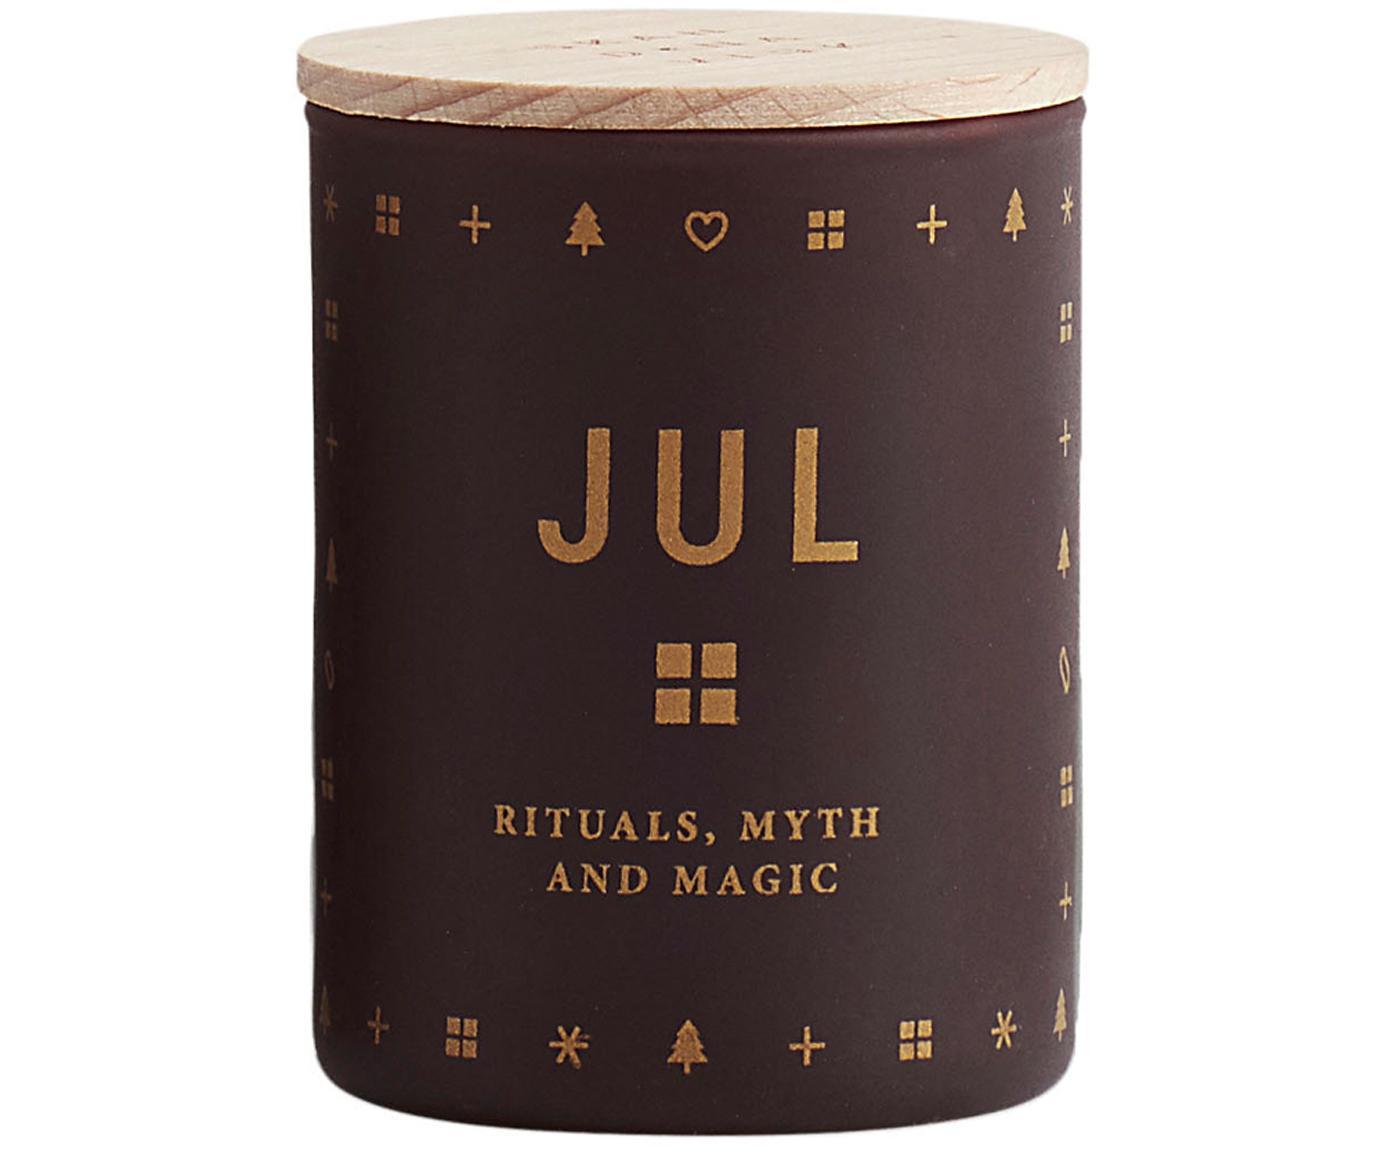 Vela perfumada Jul (pan de jengibre, miel y clavos), Recipiente: vidrio, Tapa: madera dehaya, Borgoña, Tapa: madera dehaya, Ø 4 x Al 6 cm